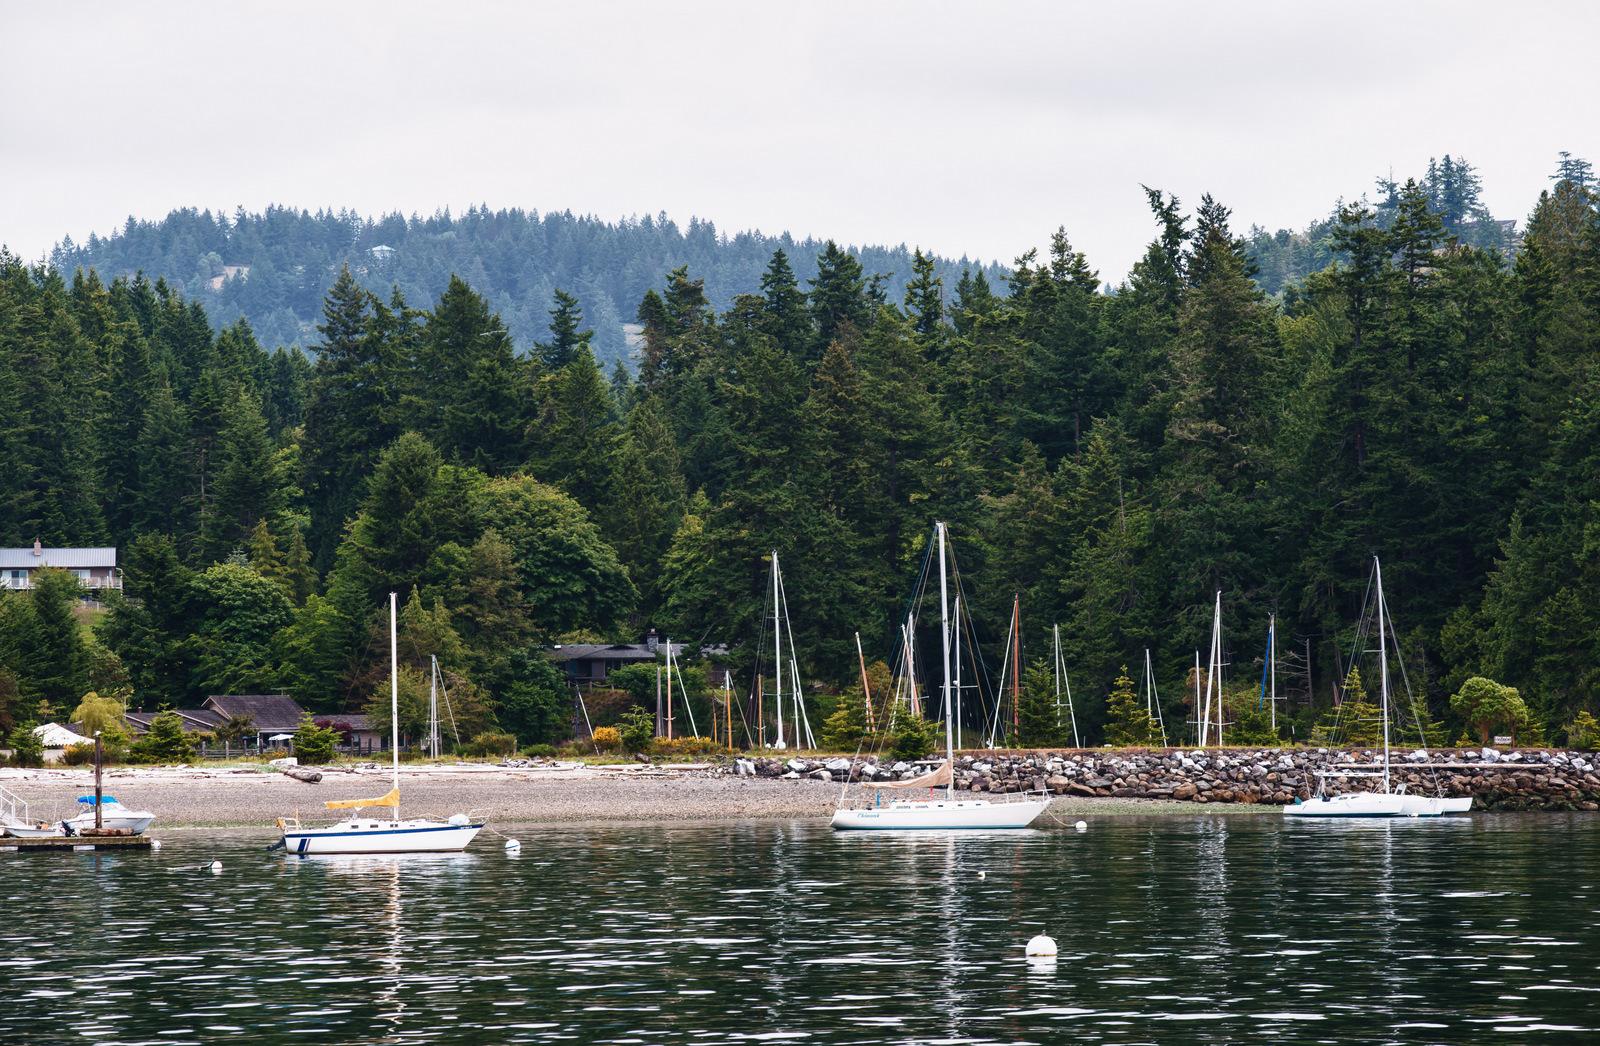 Orcas Island, Washington